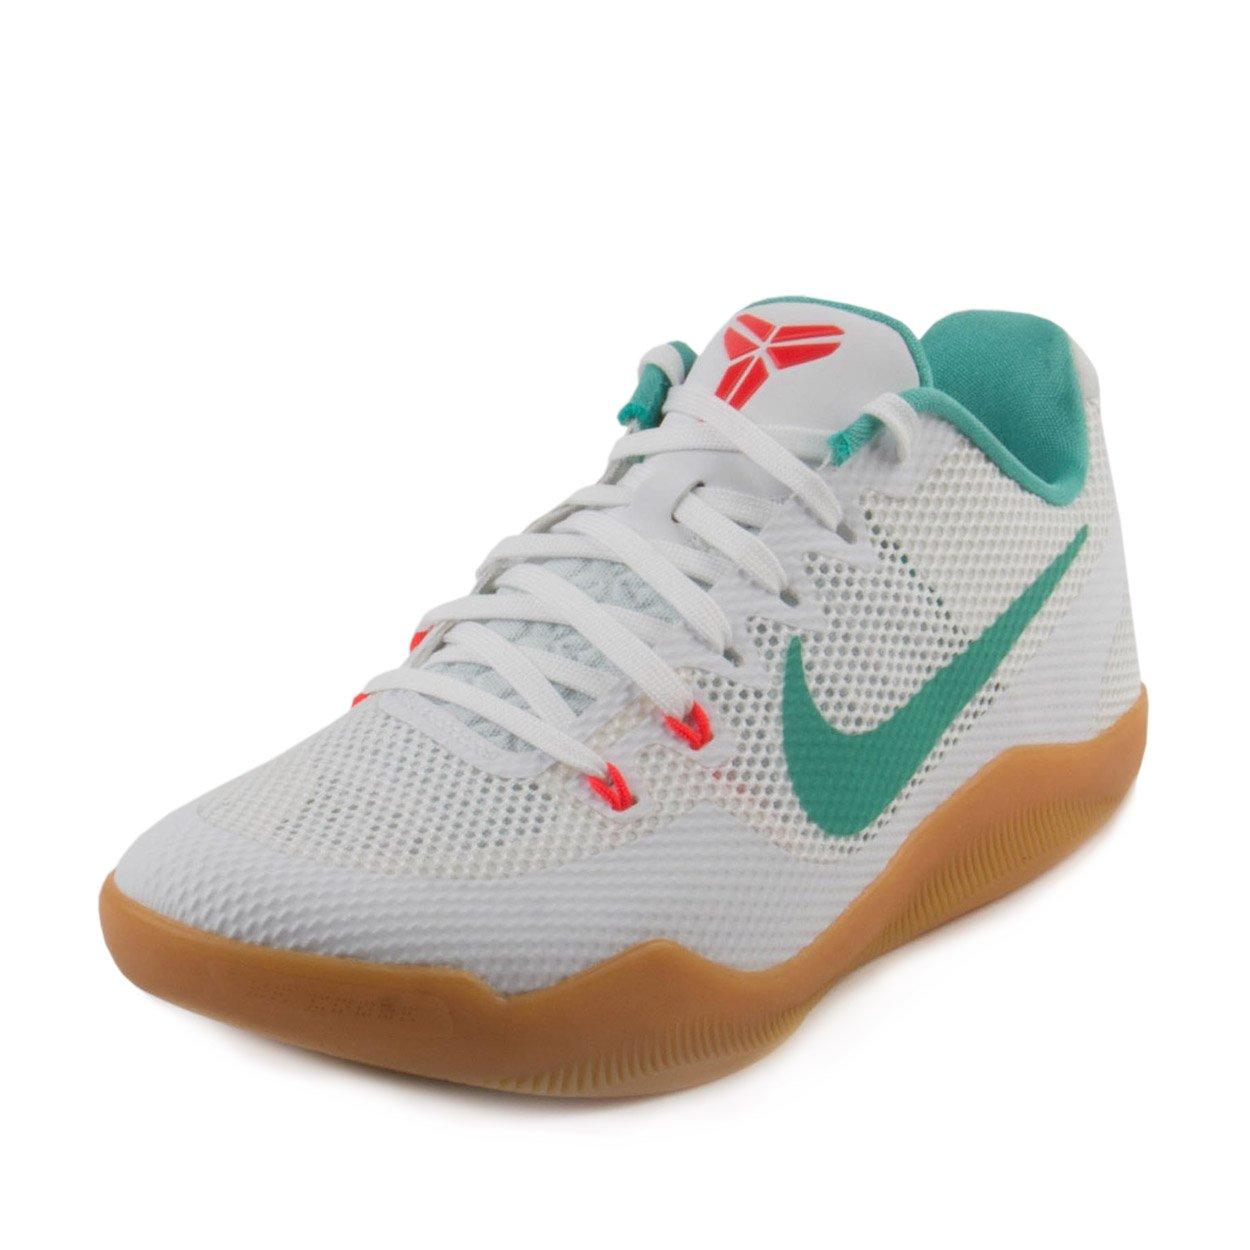 Nike Mens Kobe XI Summer Pack White/Washed Teal Leather Size 9.5